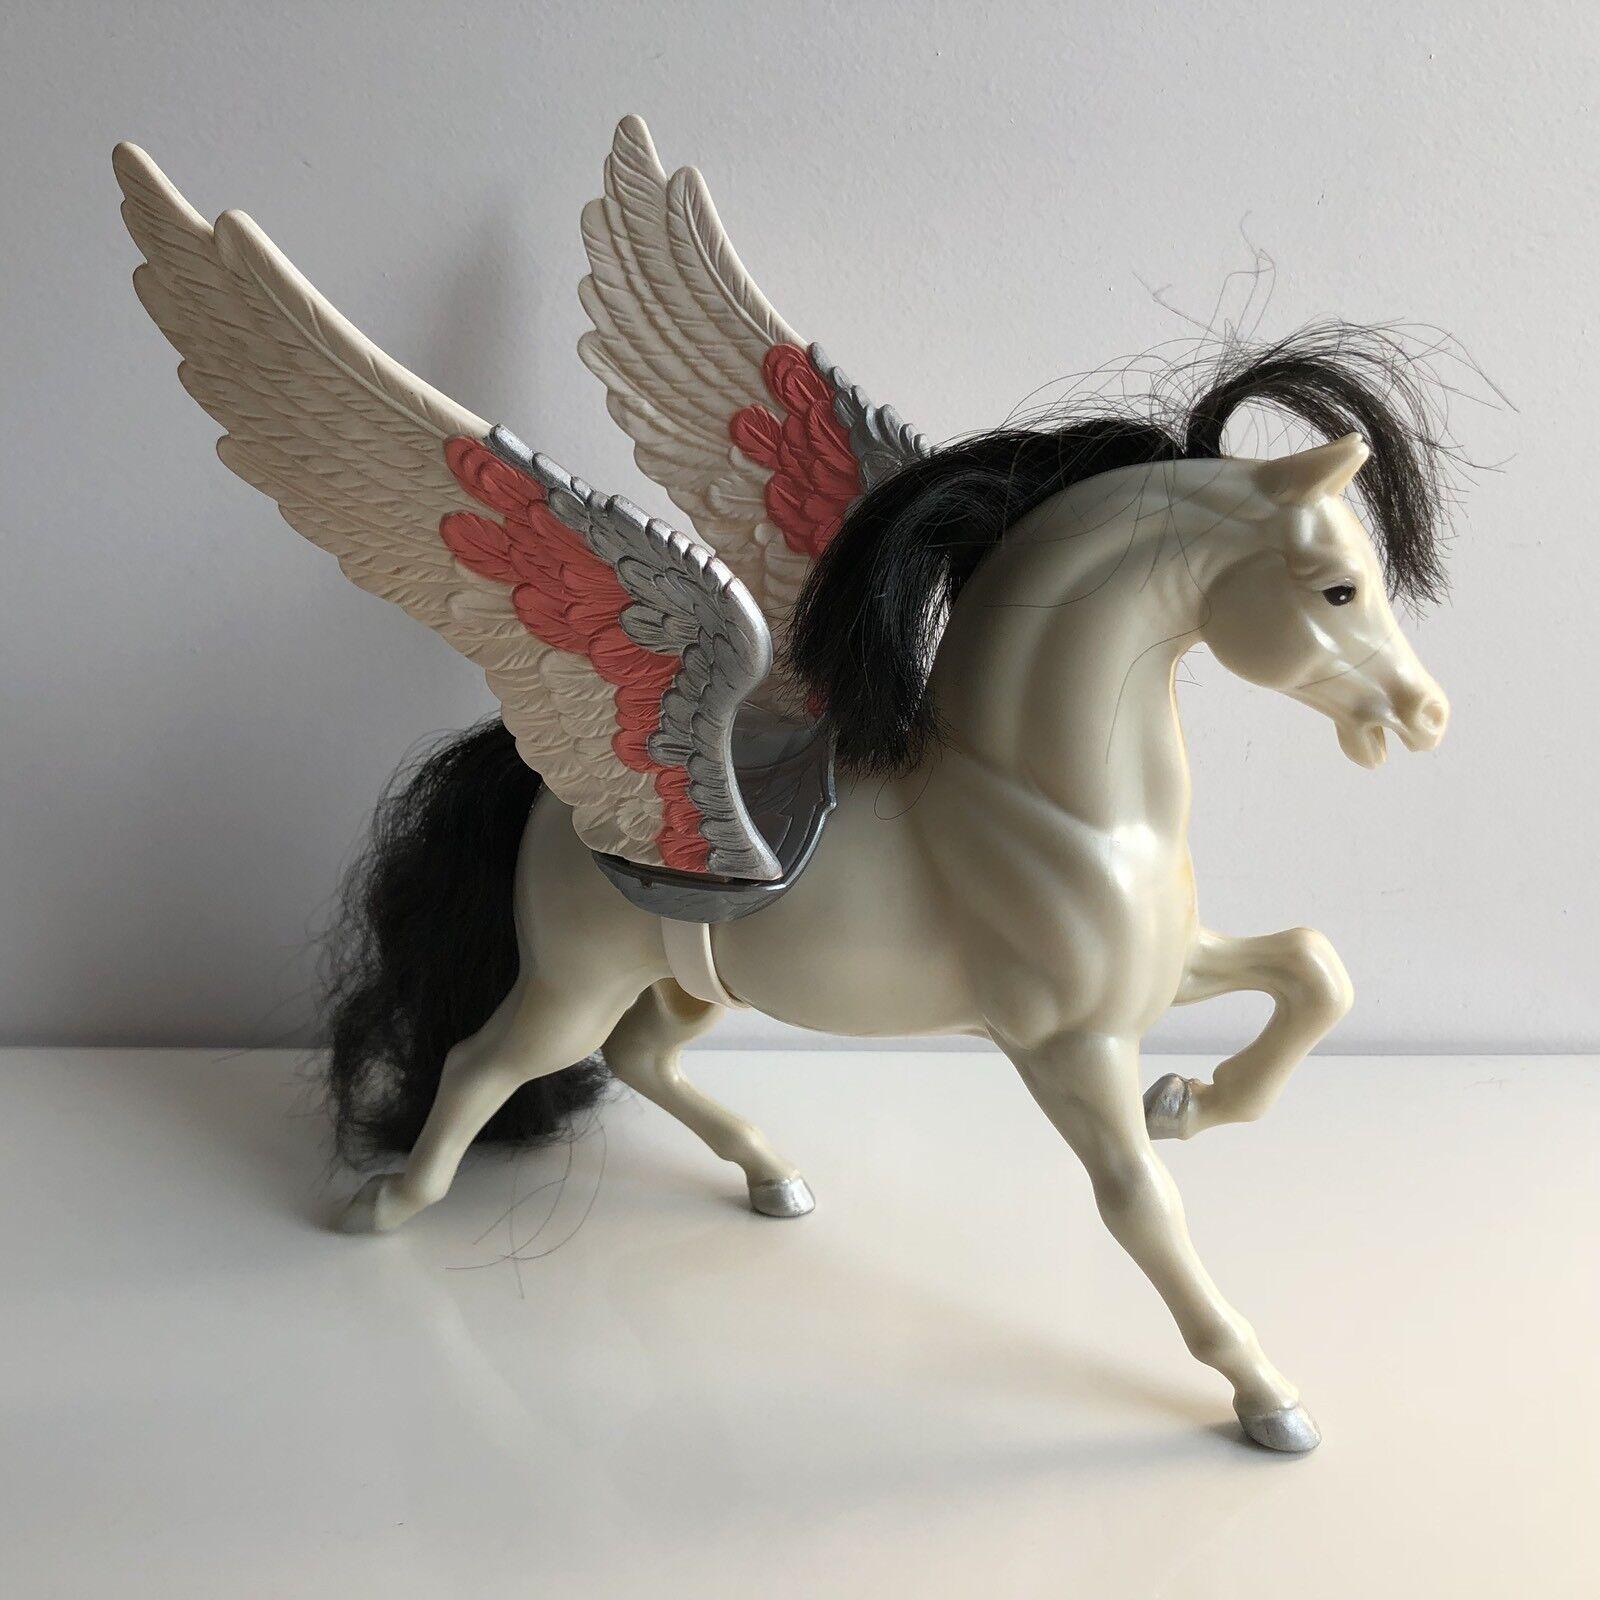 SHE RA Shera Storm Catra's Horse 100% Complete C9 RARE